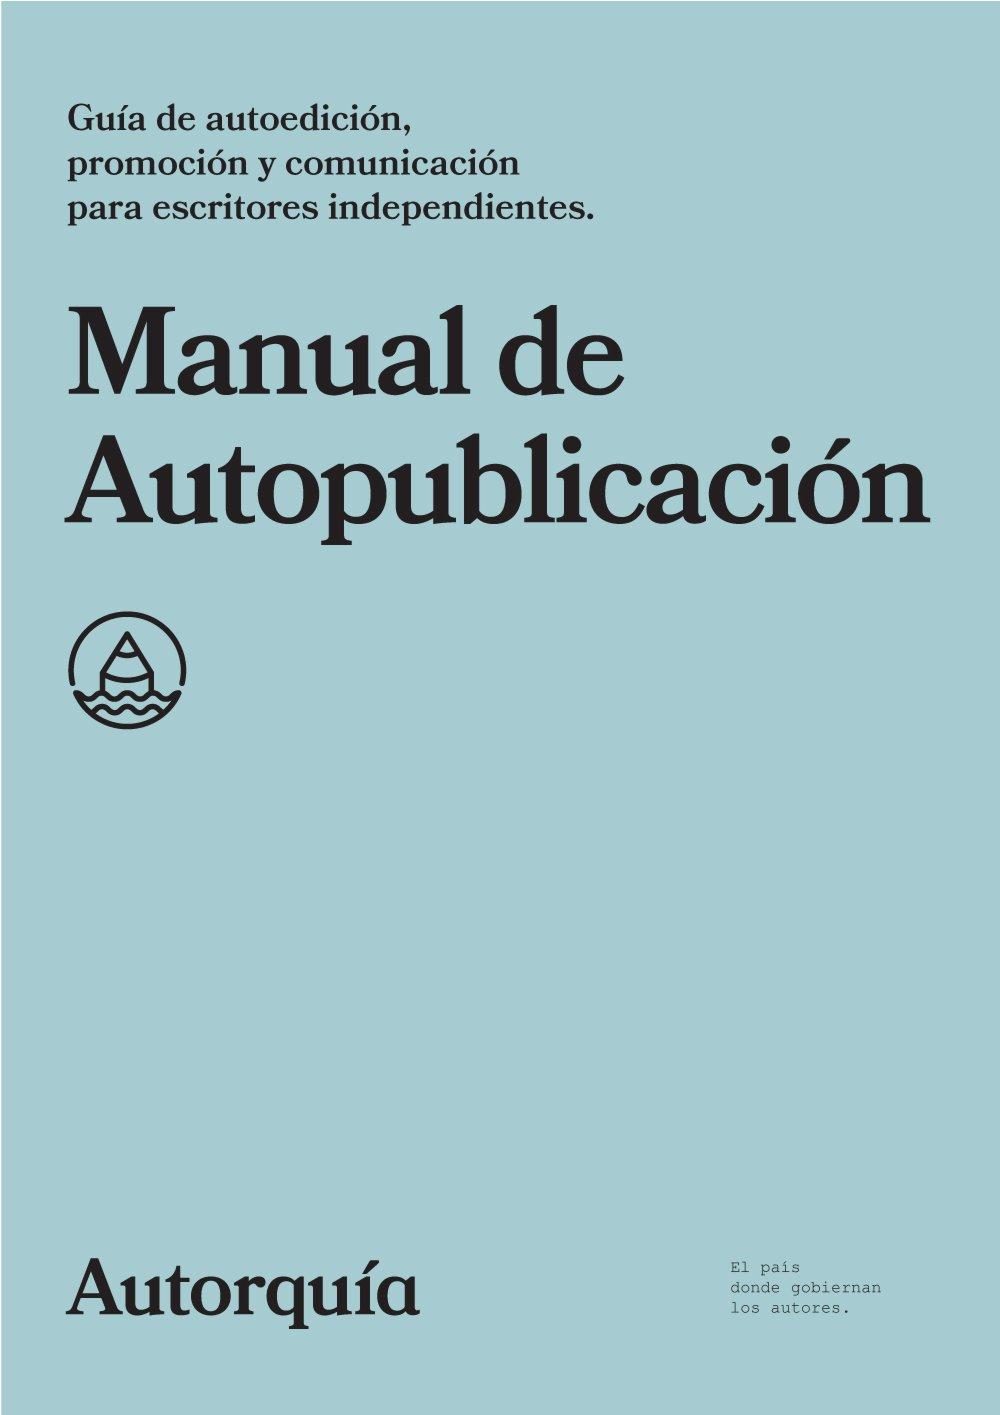 Manual de autopublicacion de Autorquia